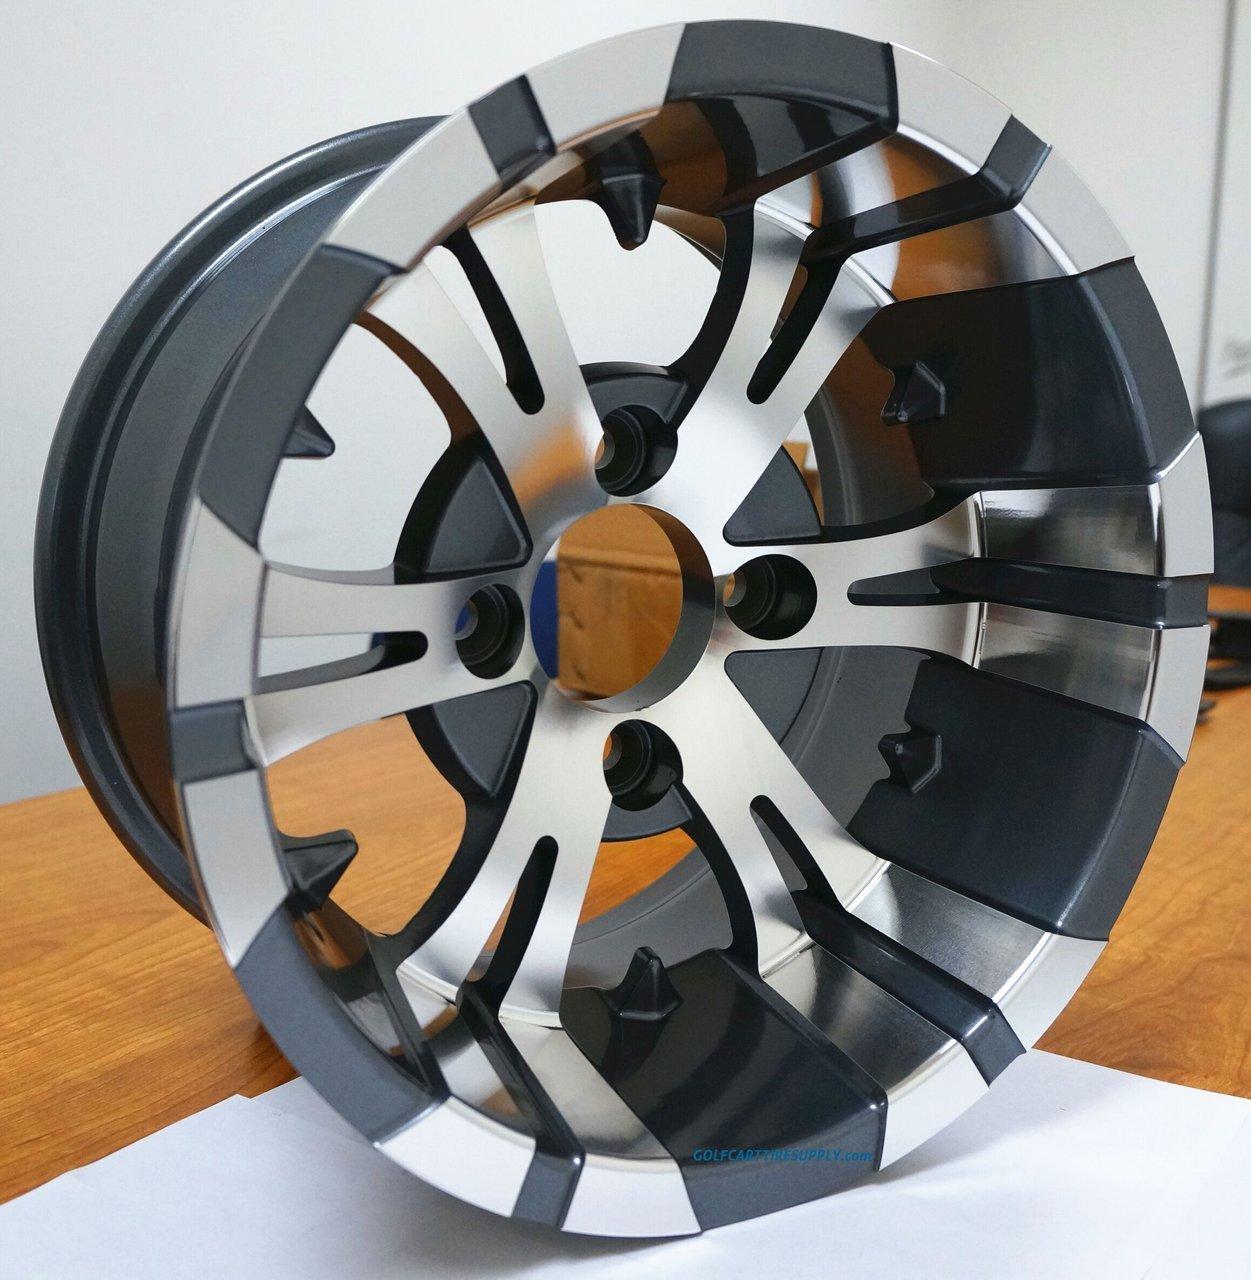 12'' Vampire Gunmetal Aluminum Wheels and 23X10.5-12'' All Terrain Golf Cart Tires Combo - Set of 4 by Golf Cart Tire Supply (Image #3)